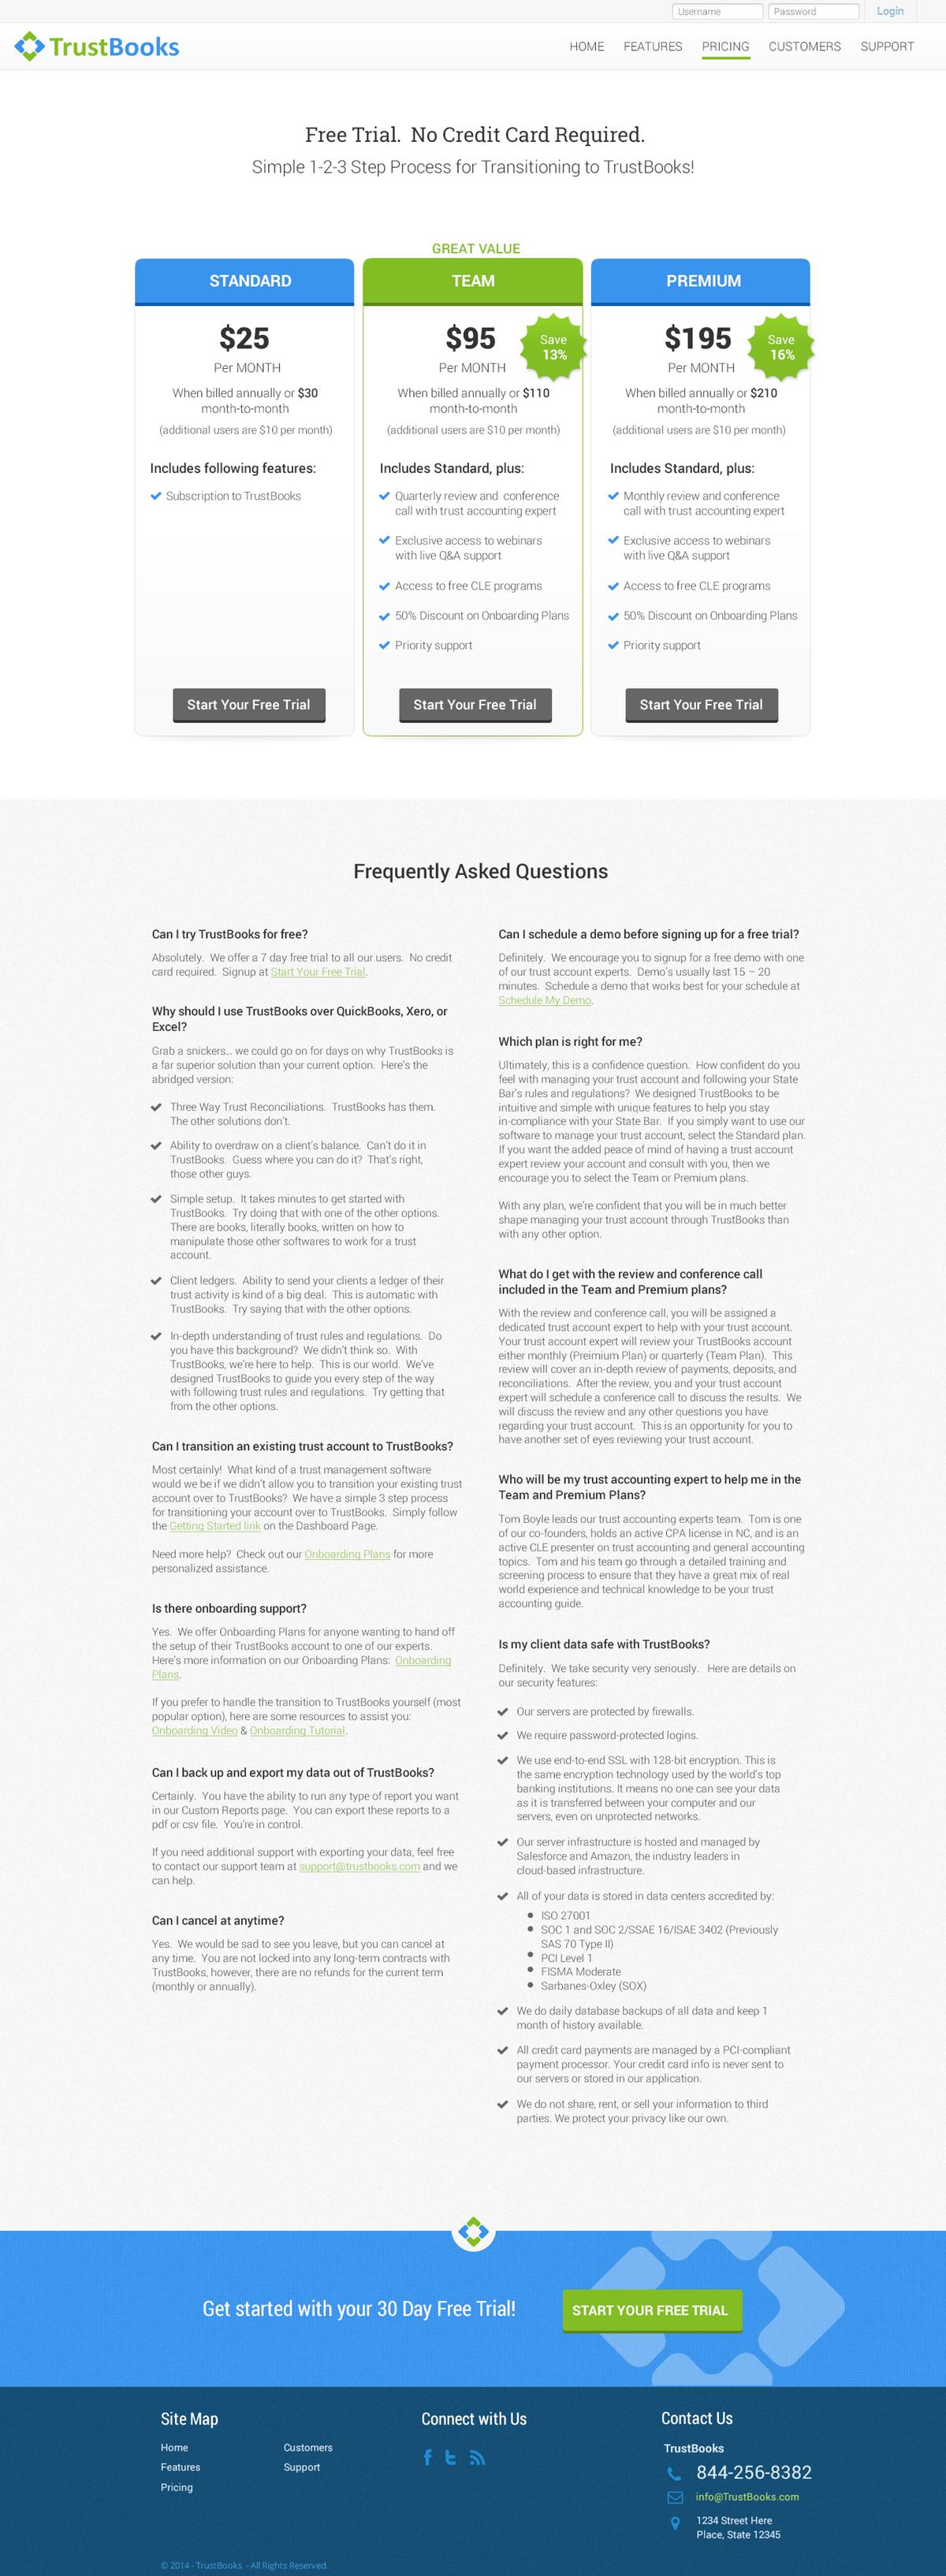 TrustBooks Website Design - Version 1.1